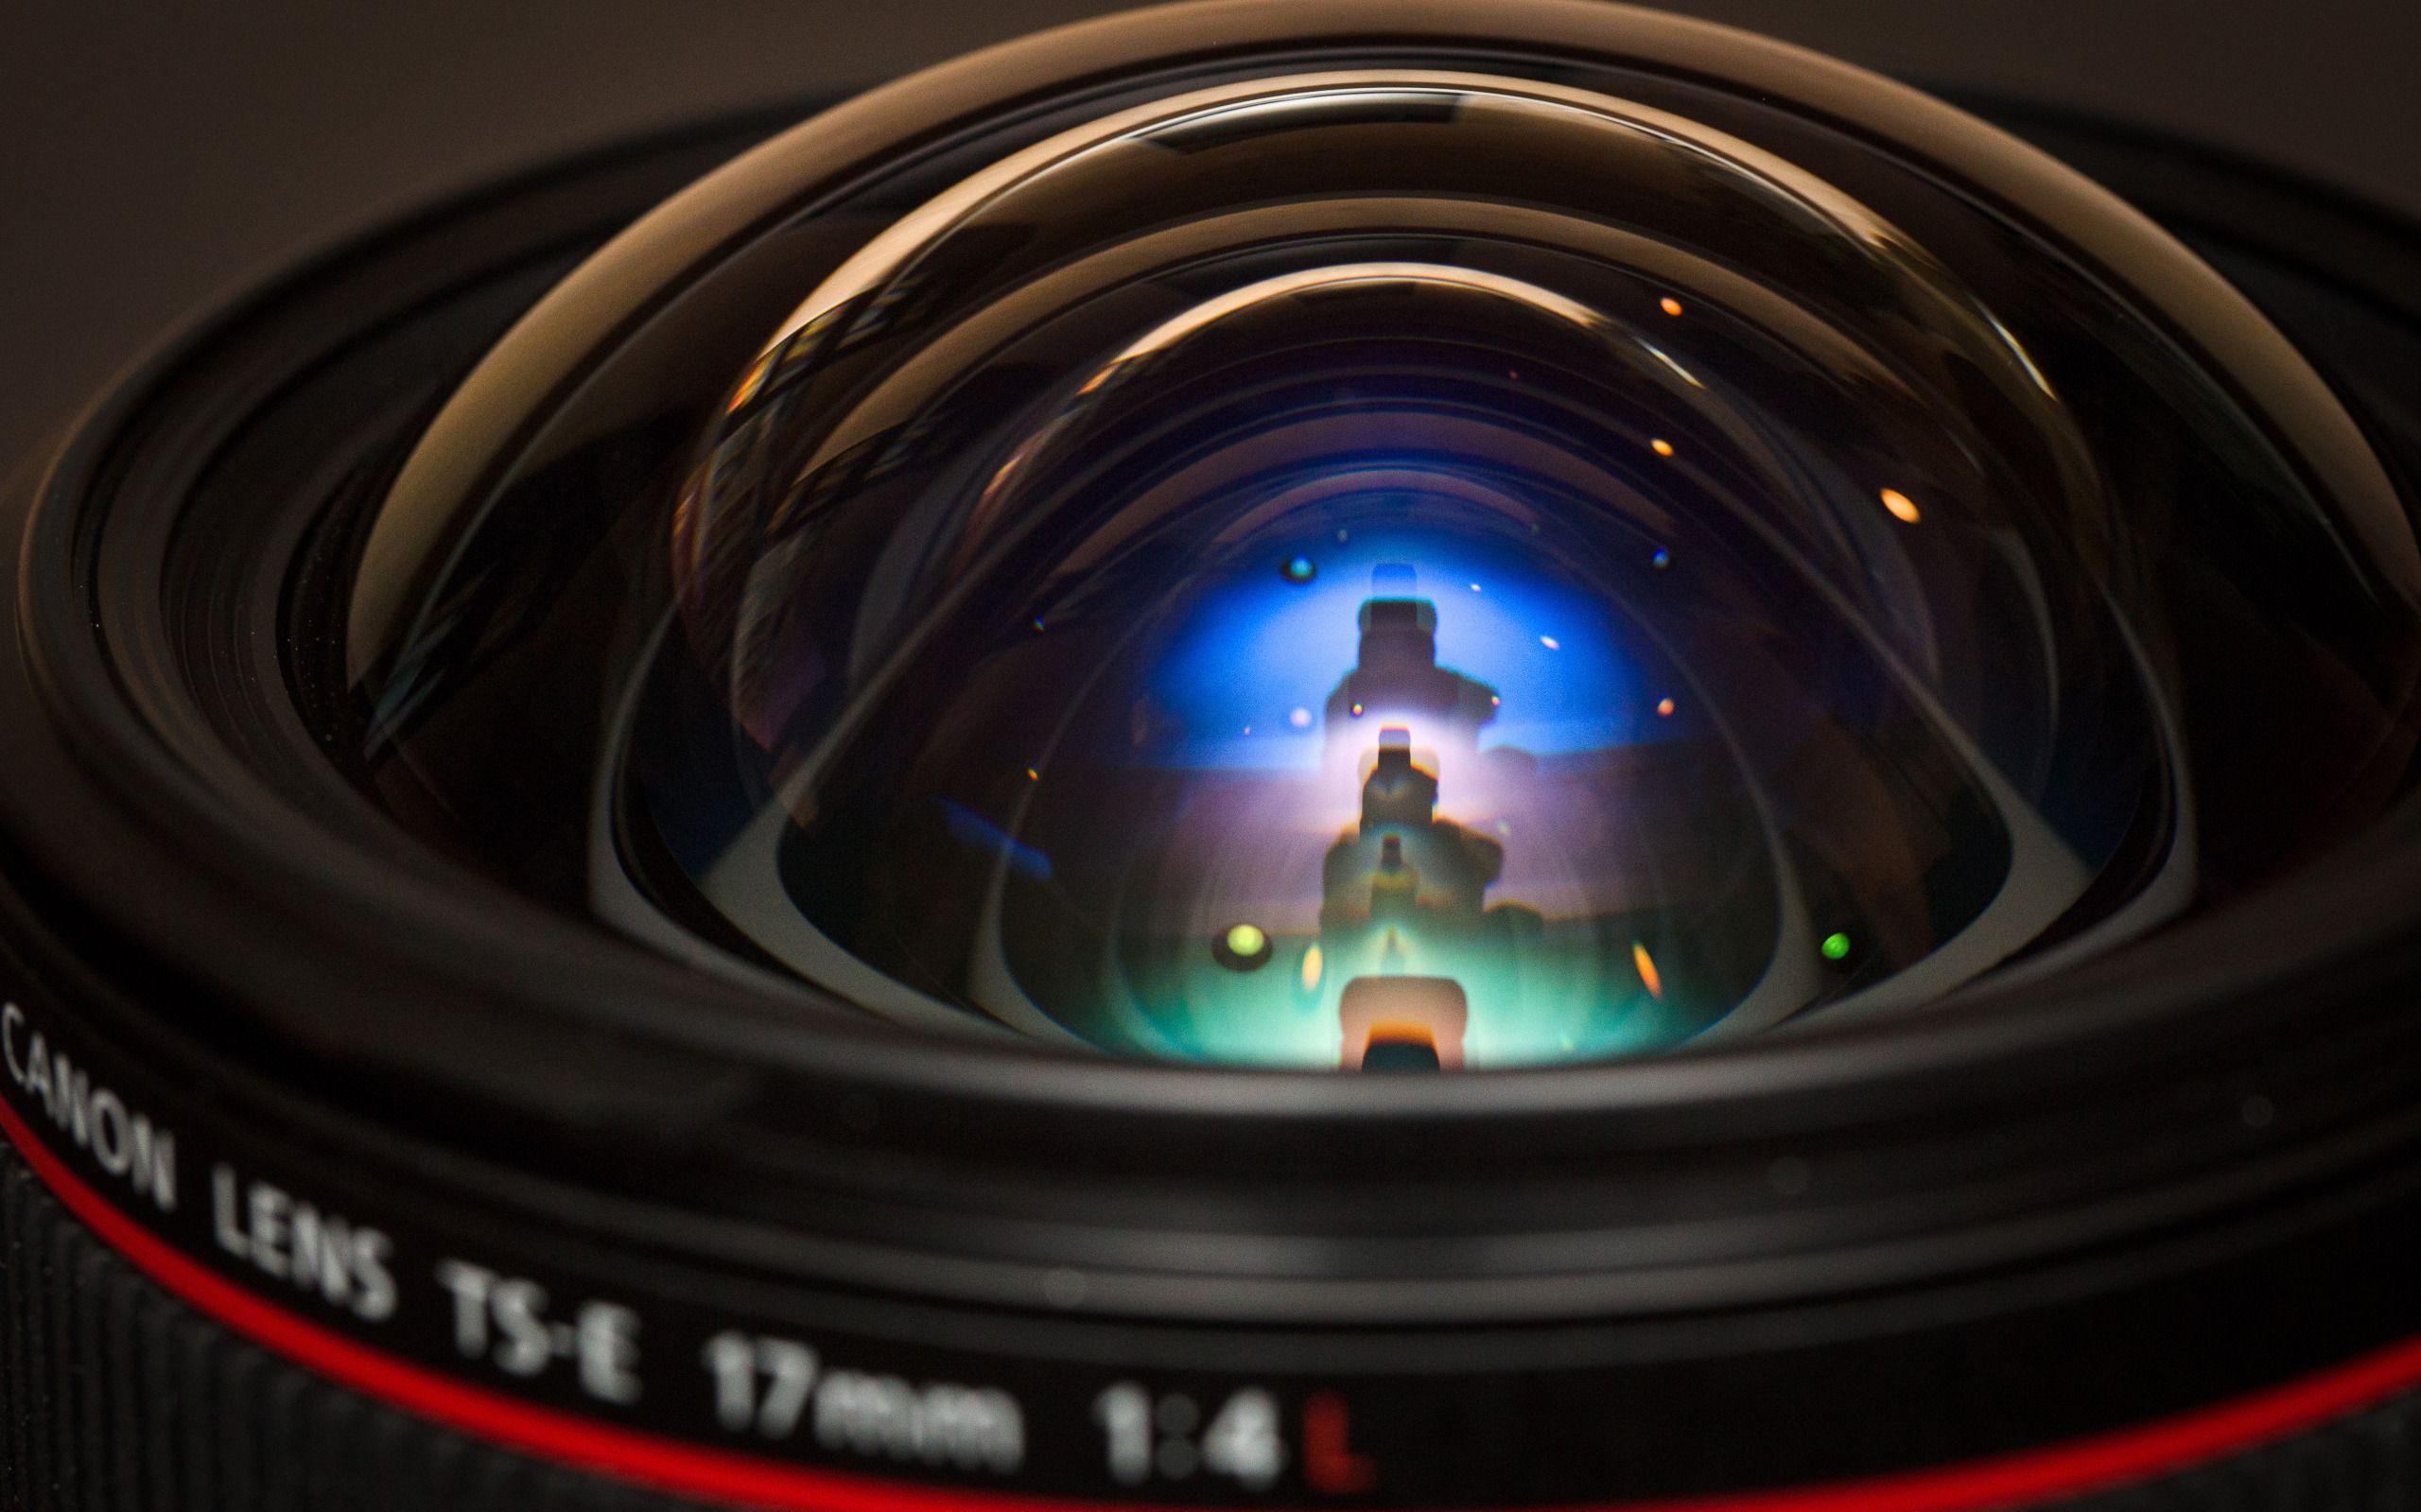 Camera Lens Wallpapers Desktop Background : Other Wallpaper ...